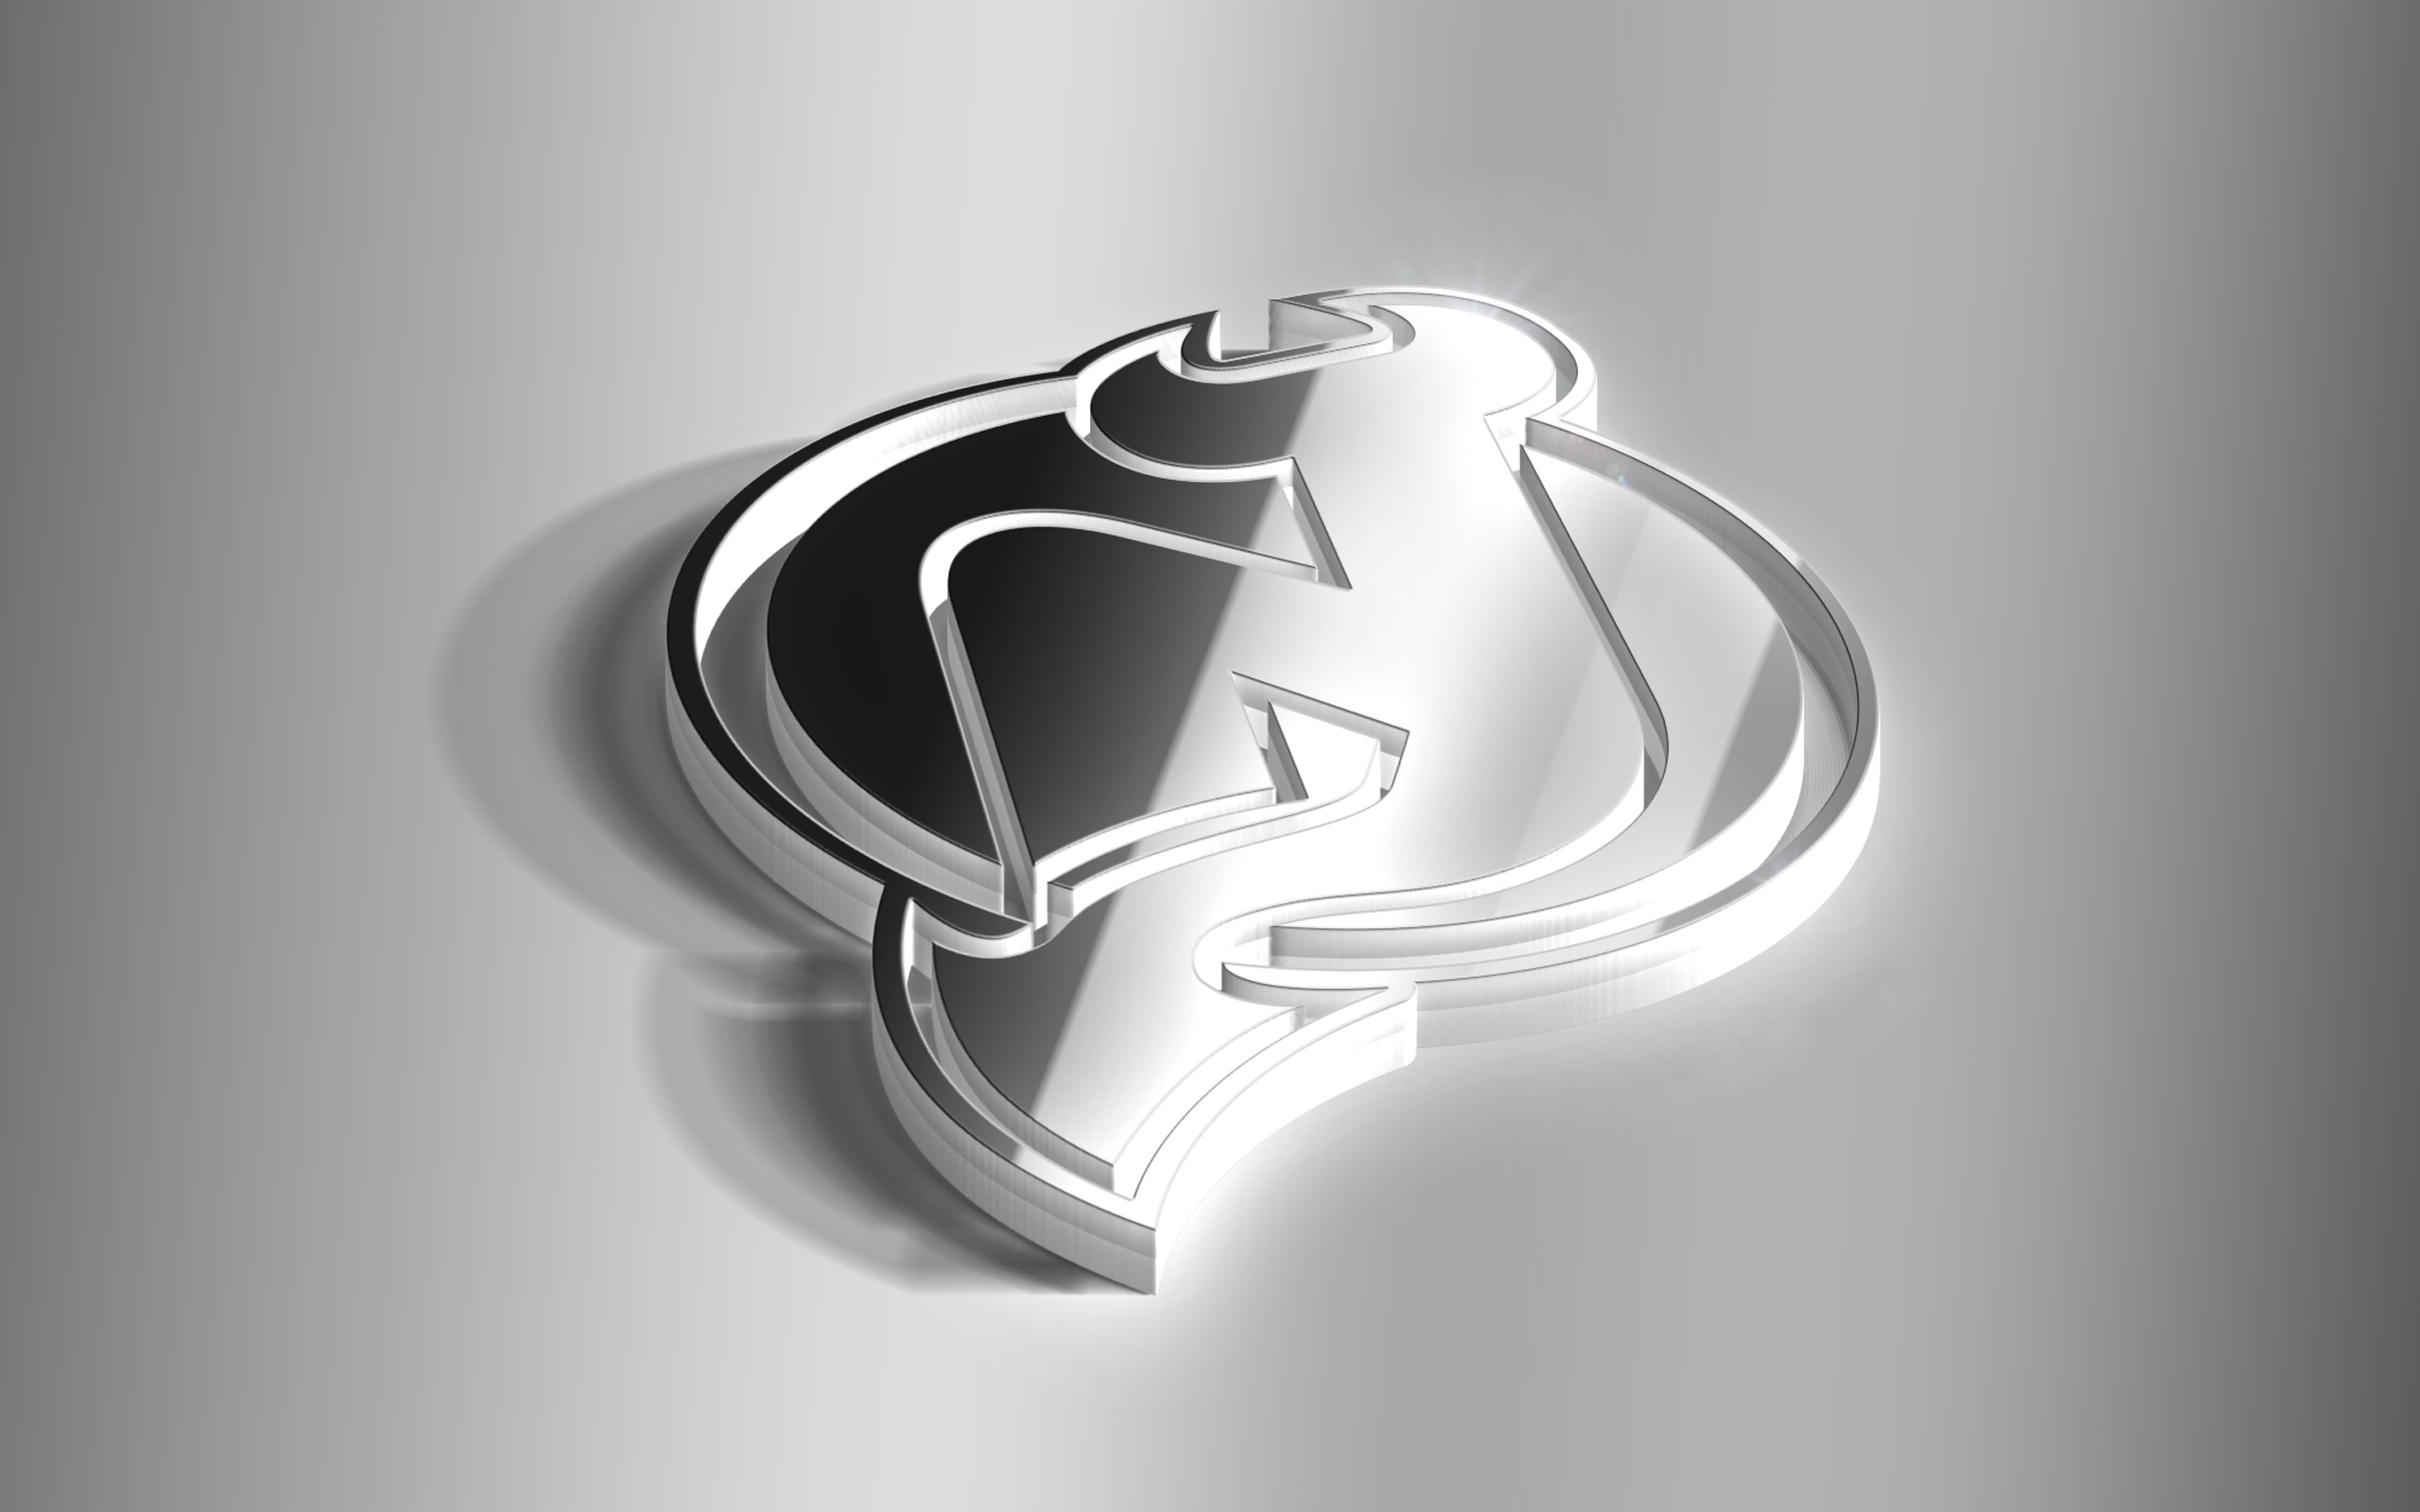 New Jersey Devils Hd Wallpaper Background Image 2560x1600 Id